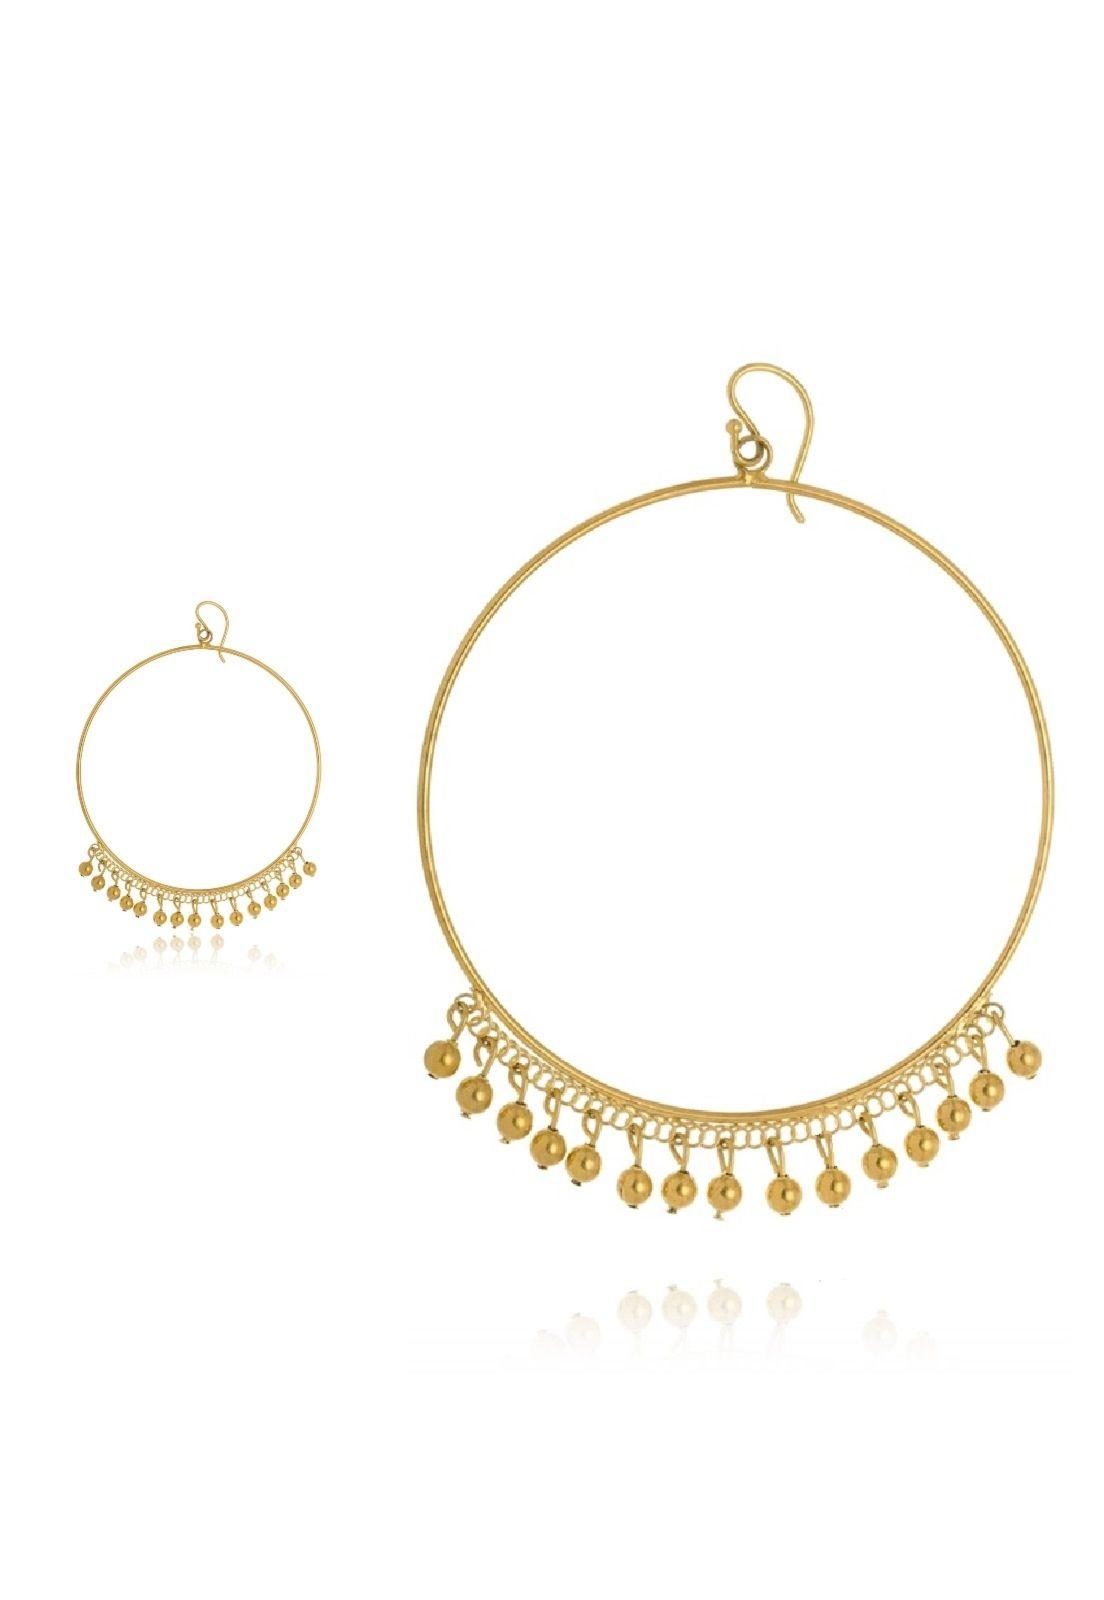 Argola Le Diamond com Mini Esferas Dourada